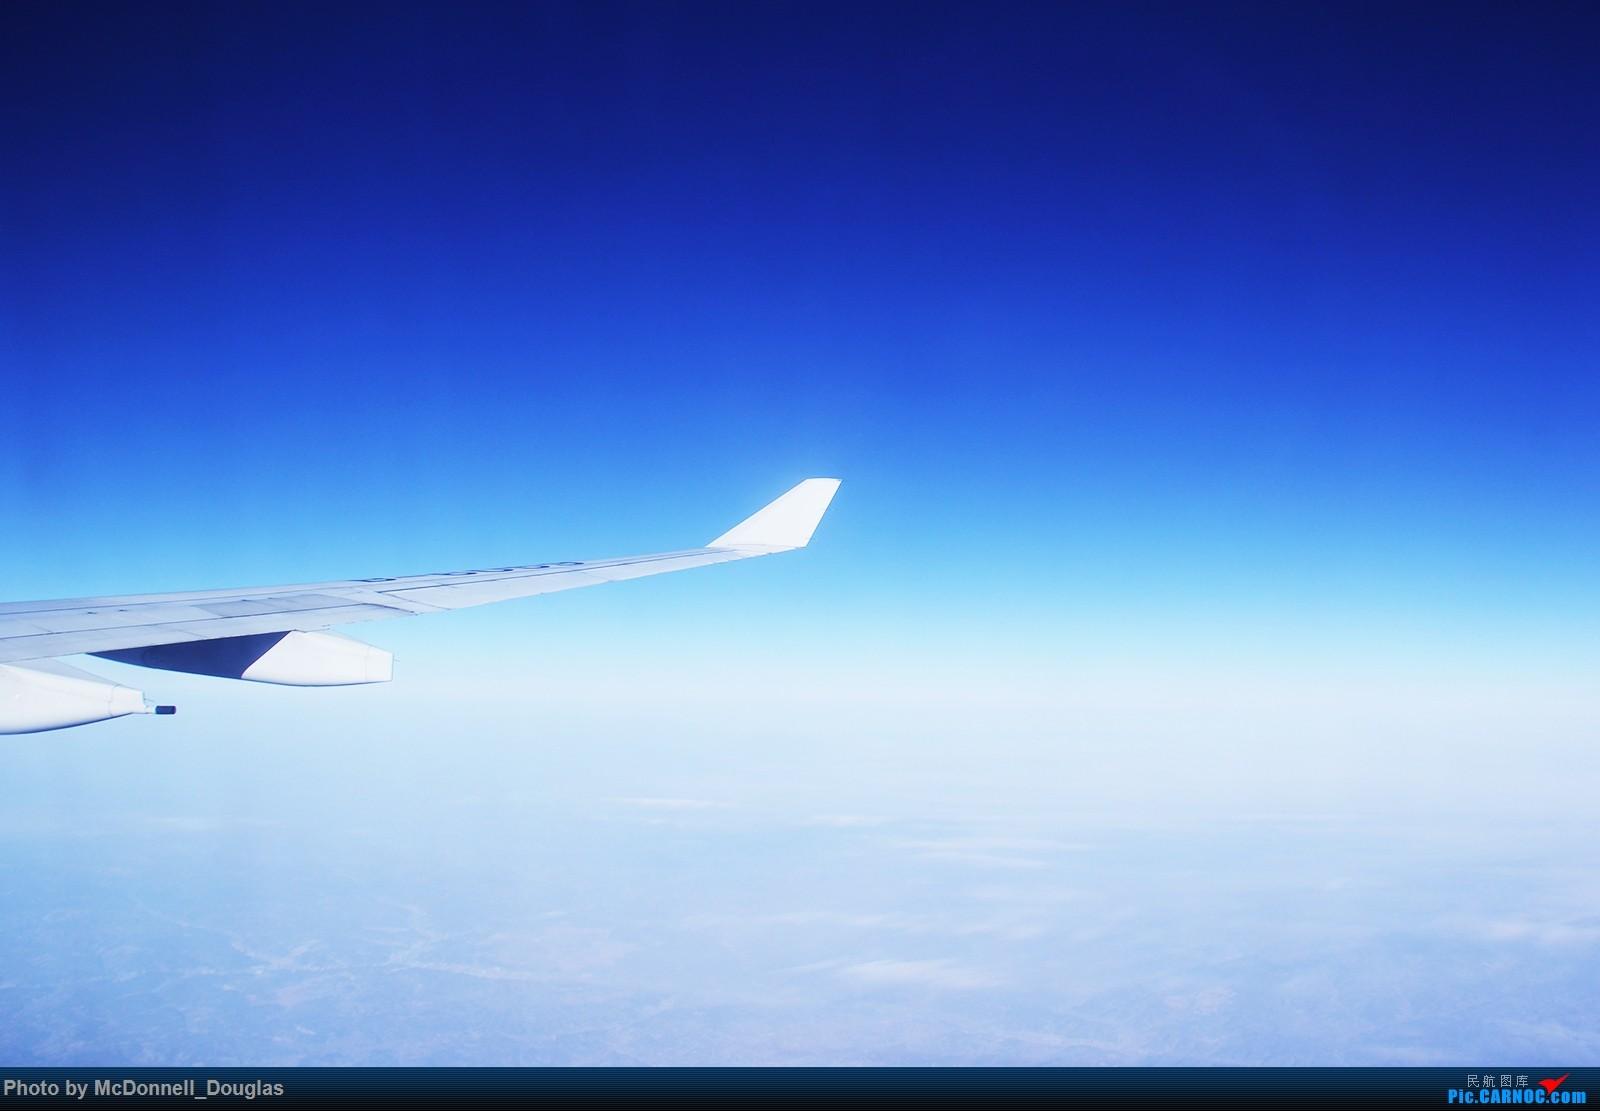 Re:[原创]【上海飞友会】【zc带你游天下(4)】不远千里飞跃喜马拉雅去看你,探寻高山另一边的神秘国度,和一群贫穷却快乐着的人们 AIRBUS A330-243 B-6059